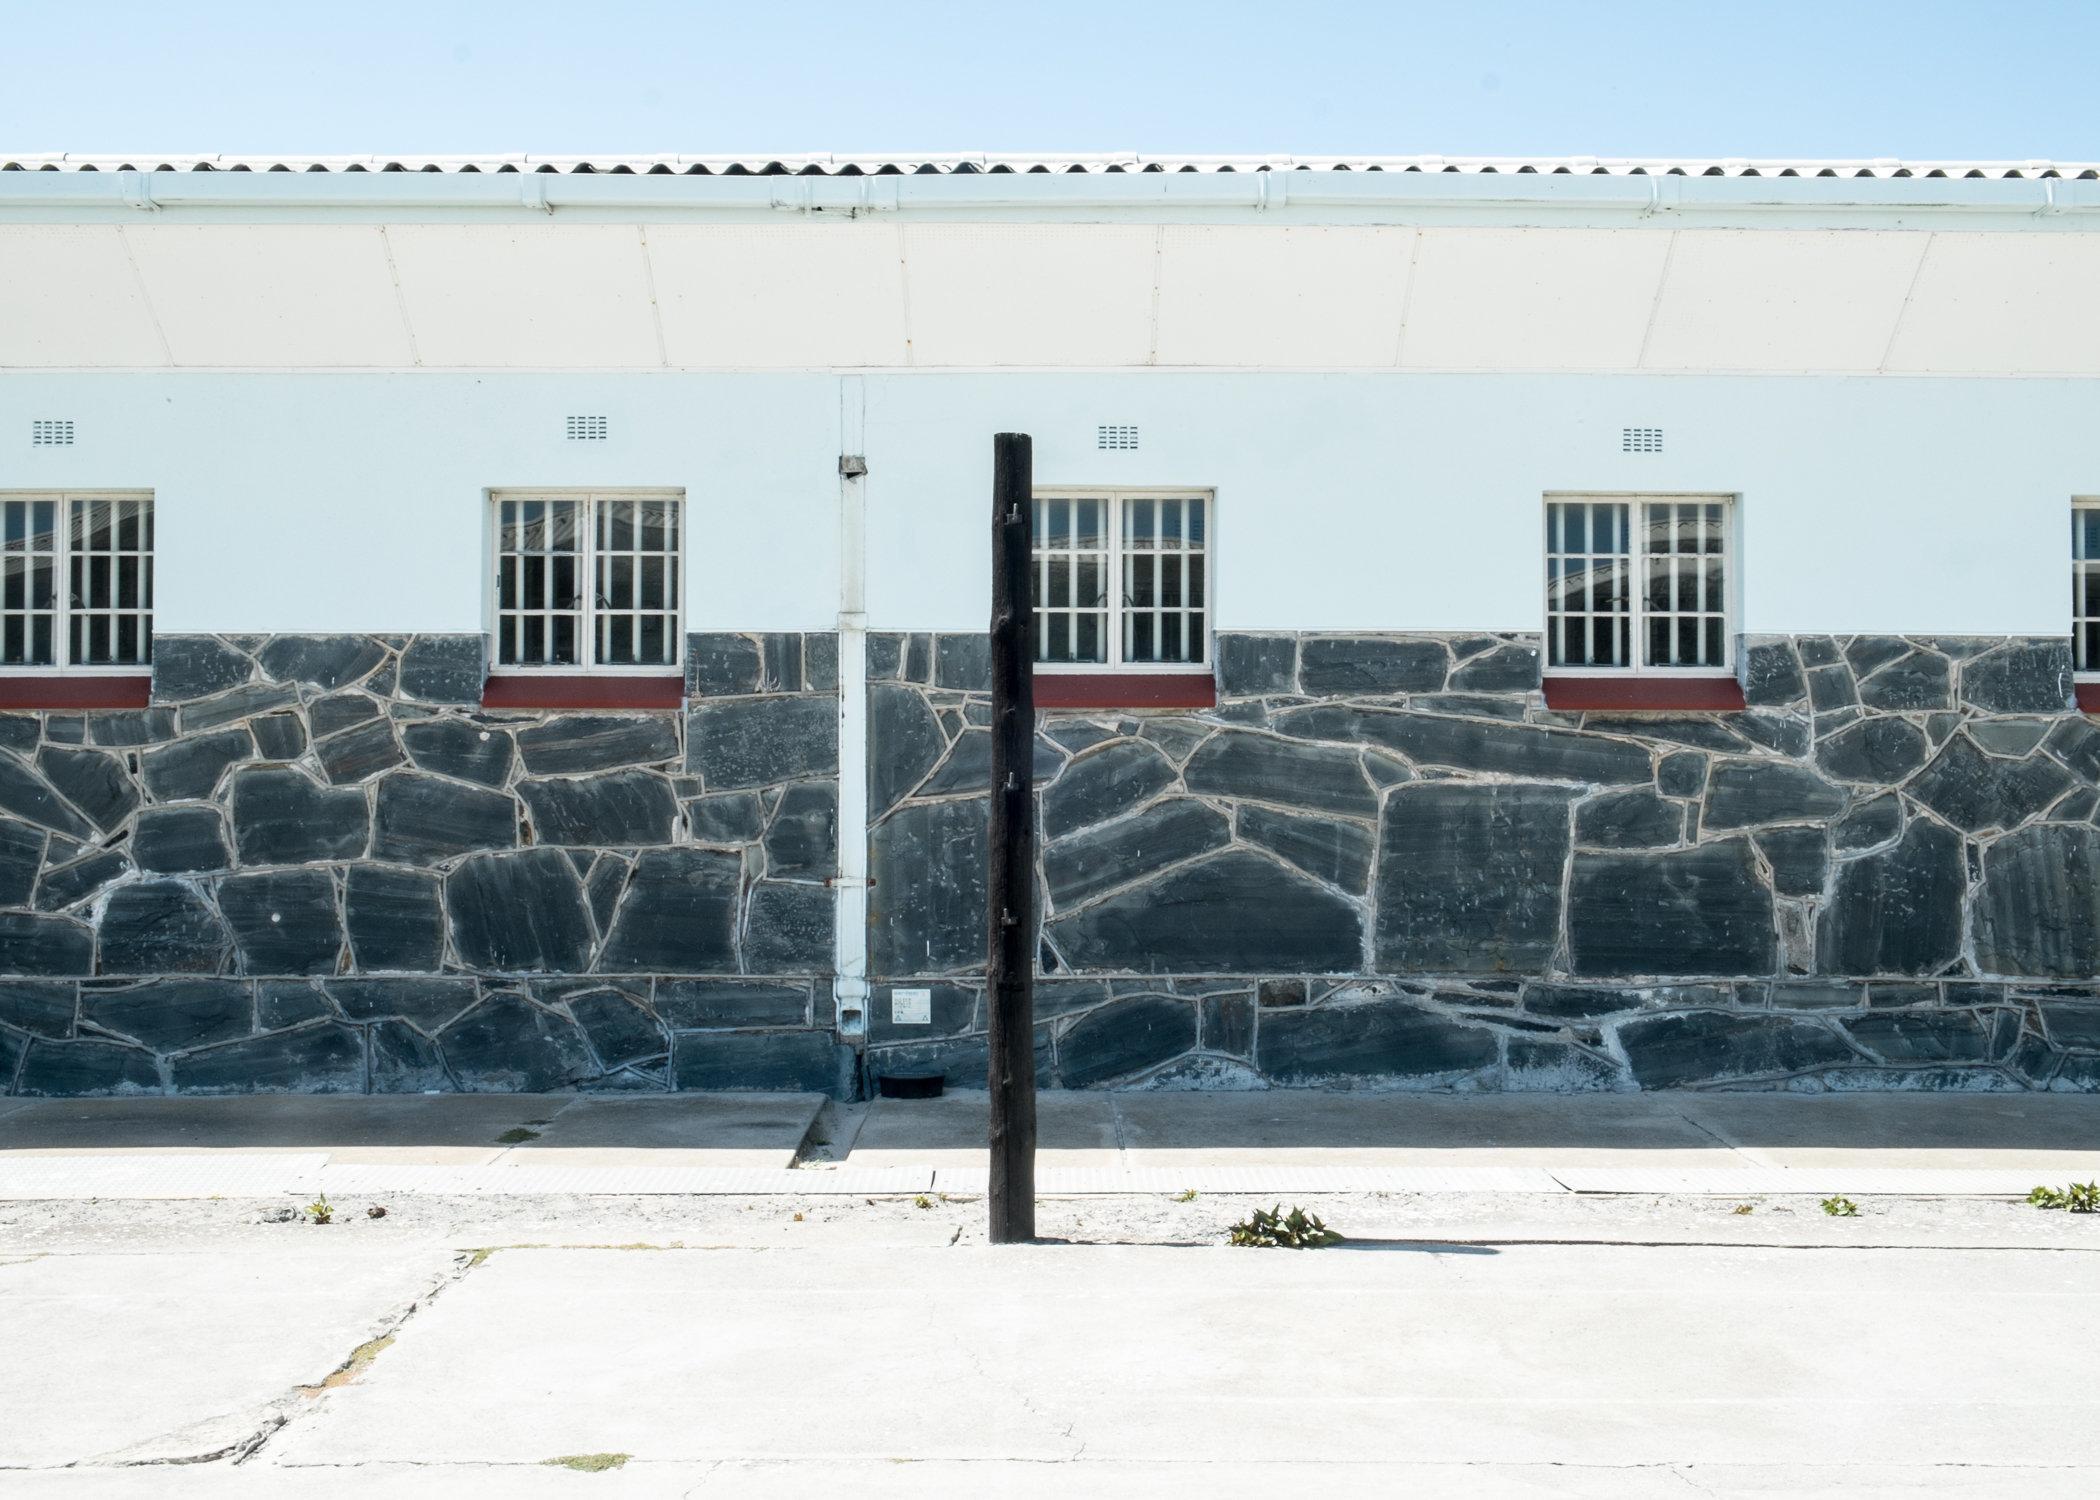 Robben_Island_Prints-8631.jpg